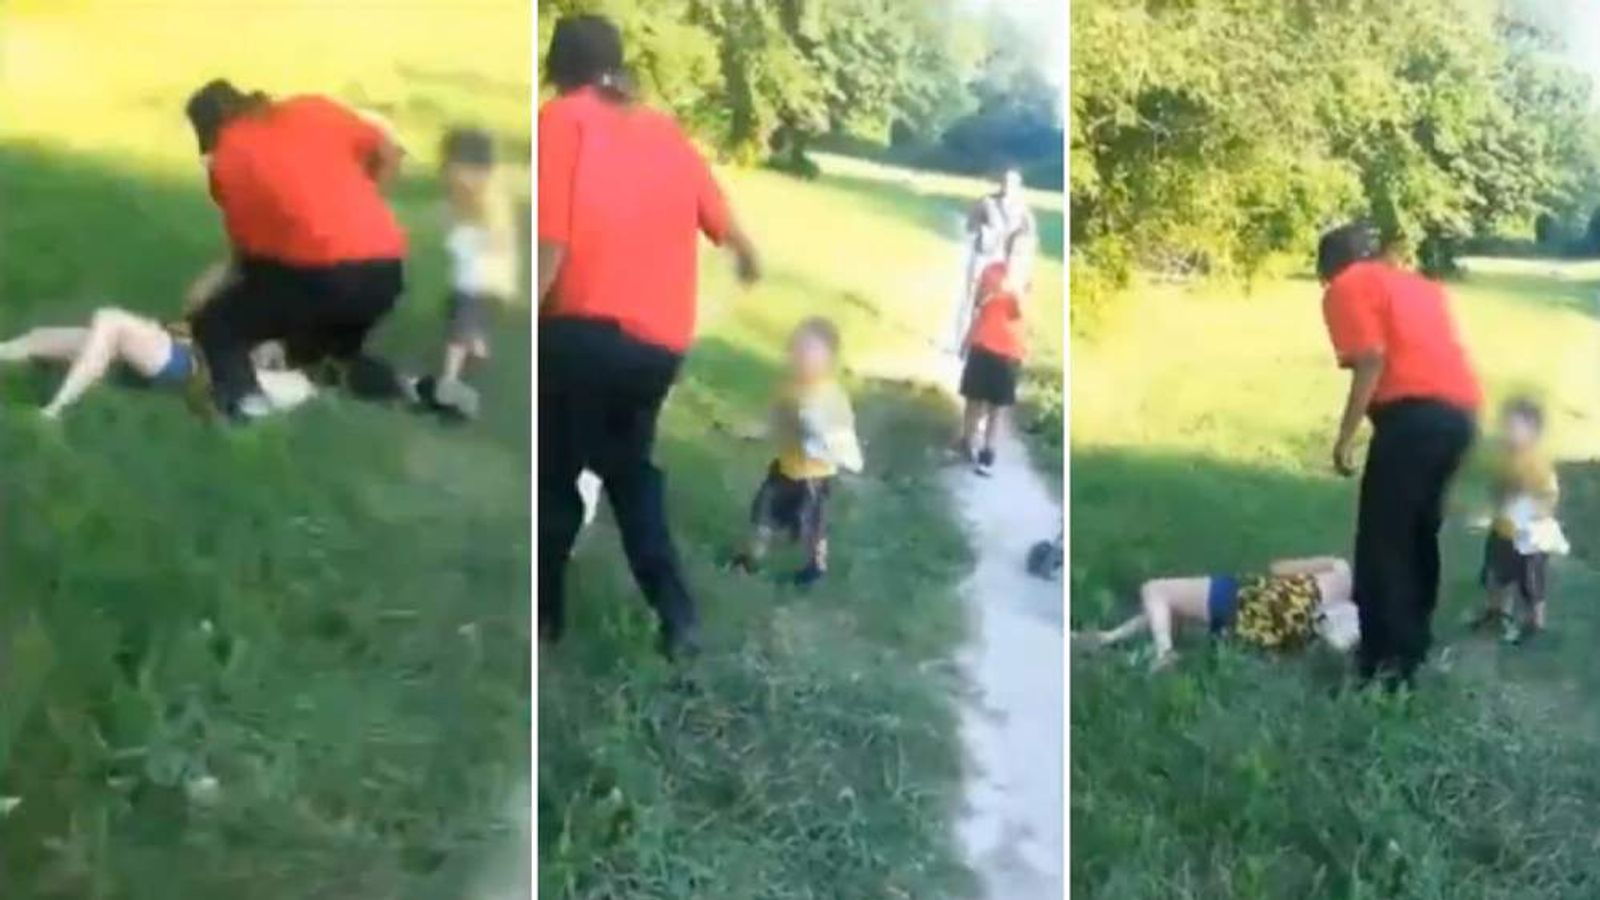 Fight involving a toddler in Salem Massecheusetts